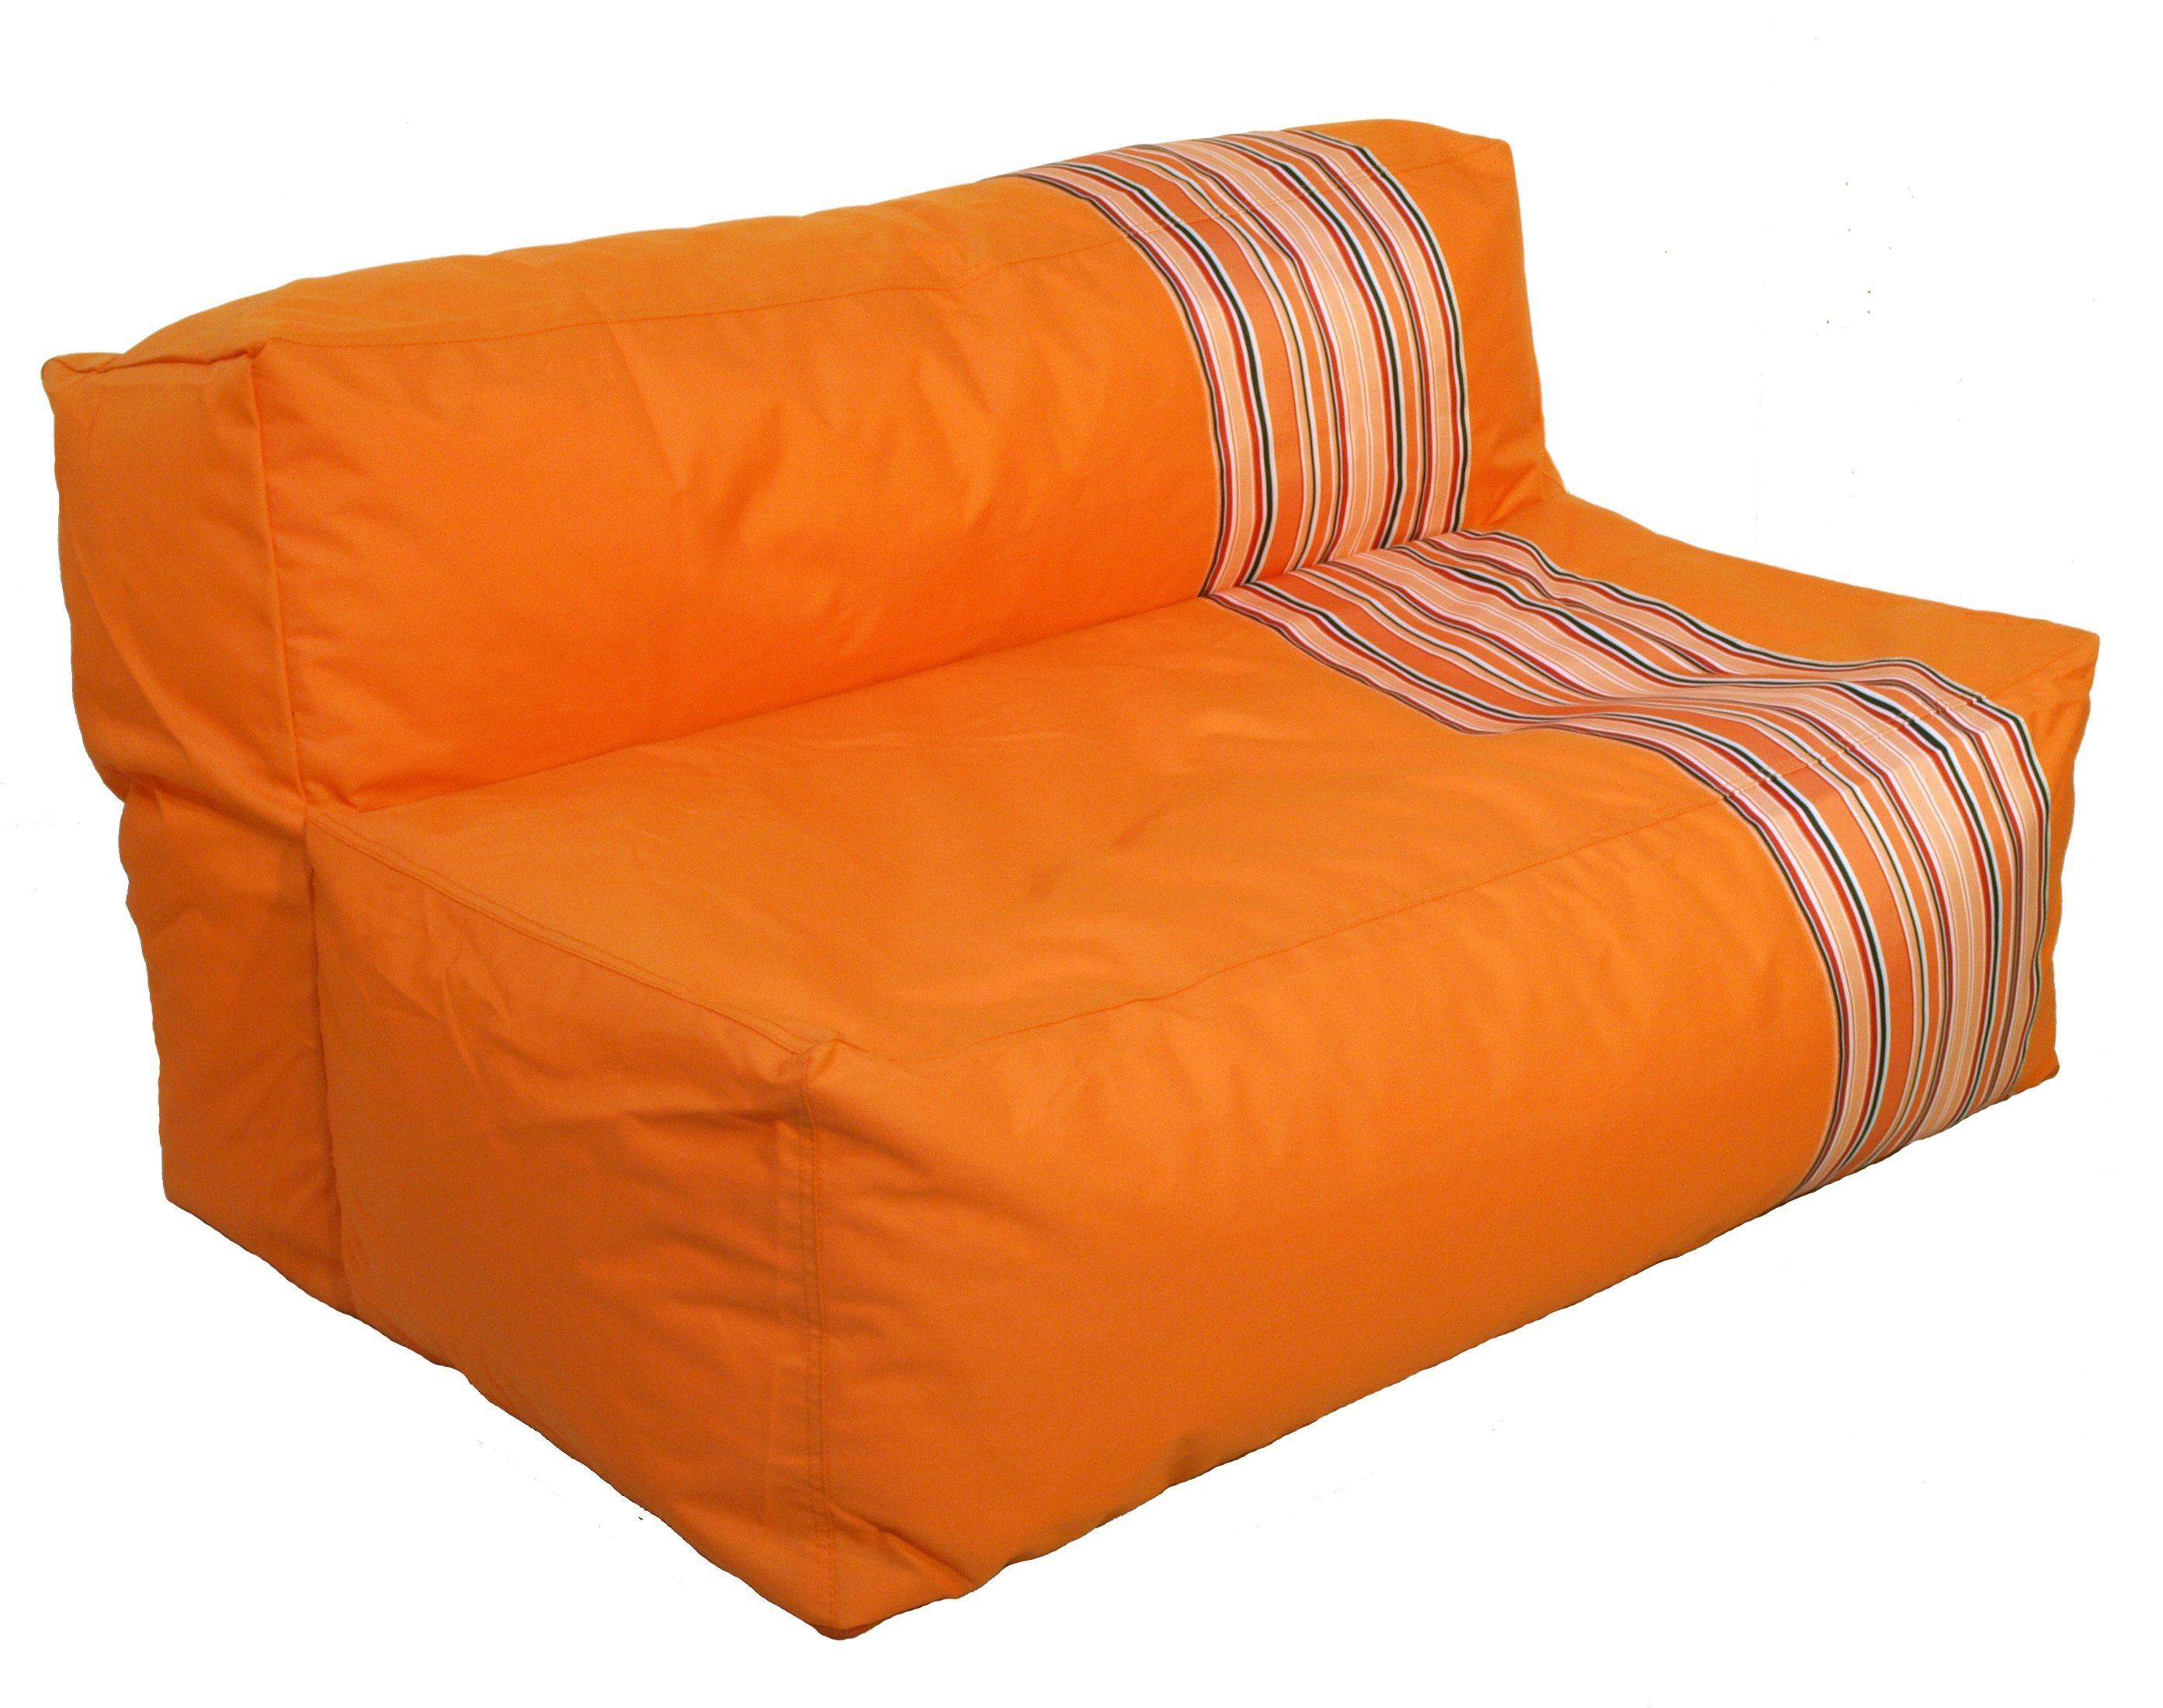 Kasper-Wohndesign Sitzsack Sofa »CHOISE« | Wohnzimmer > Sessel > Sitzsaecke | Kasper-Wohndesign